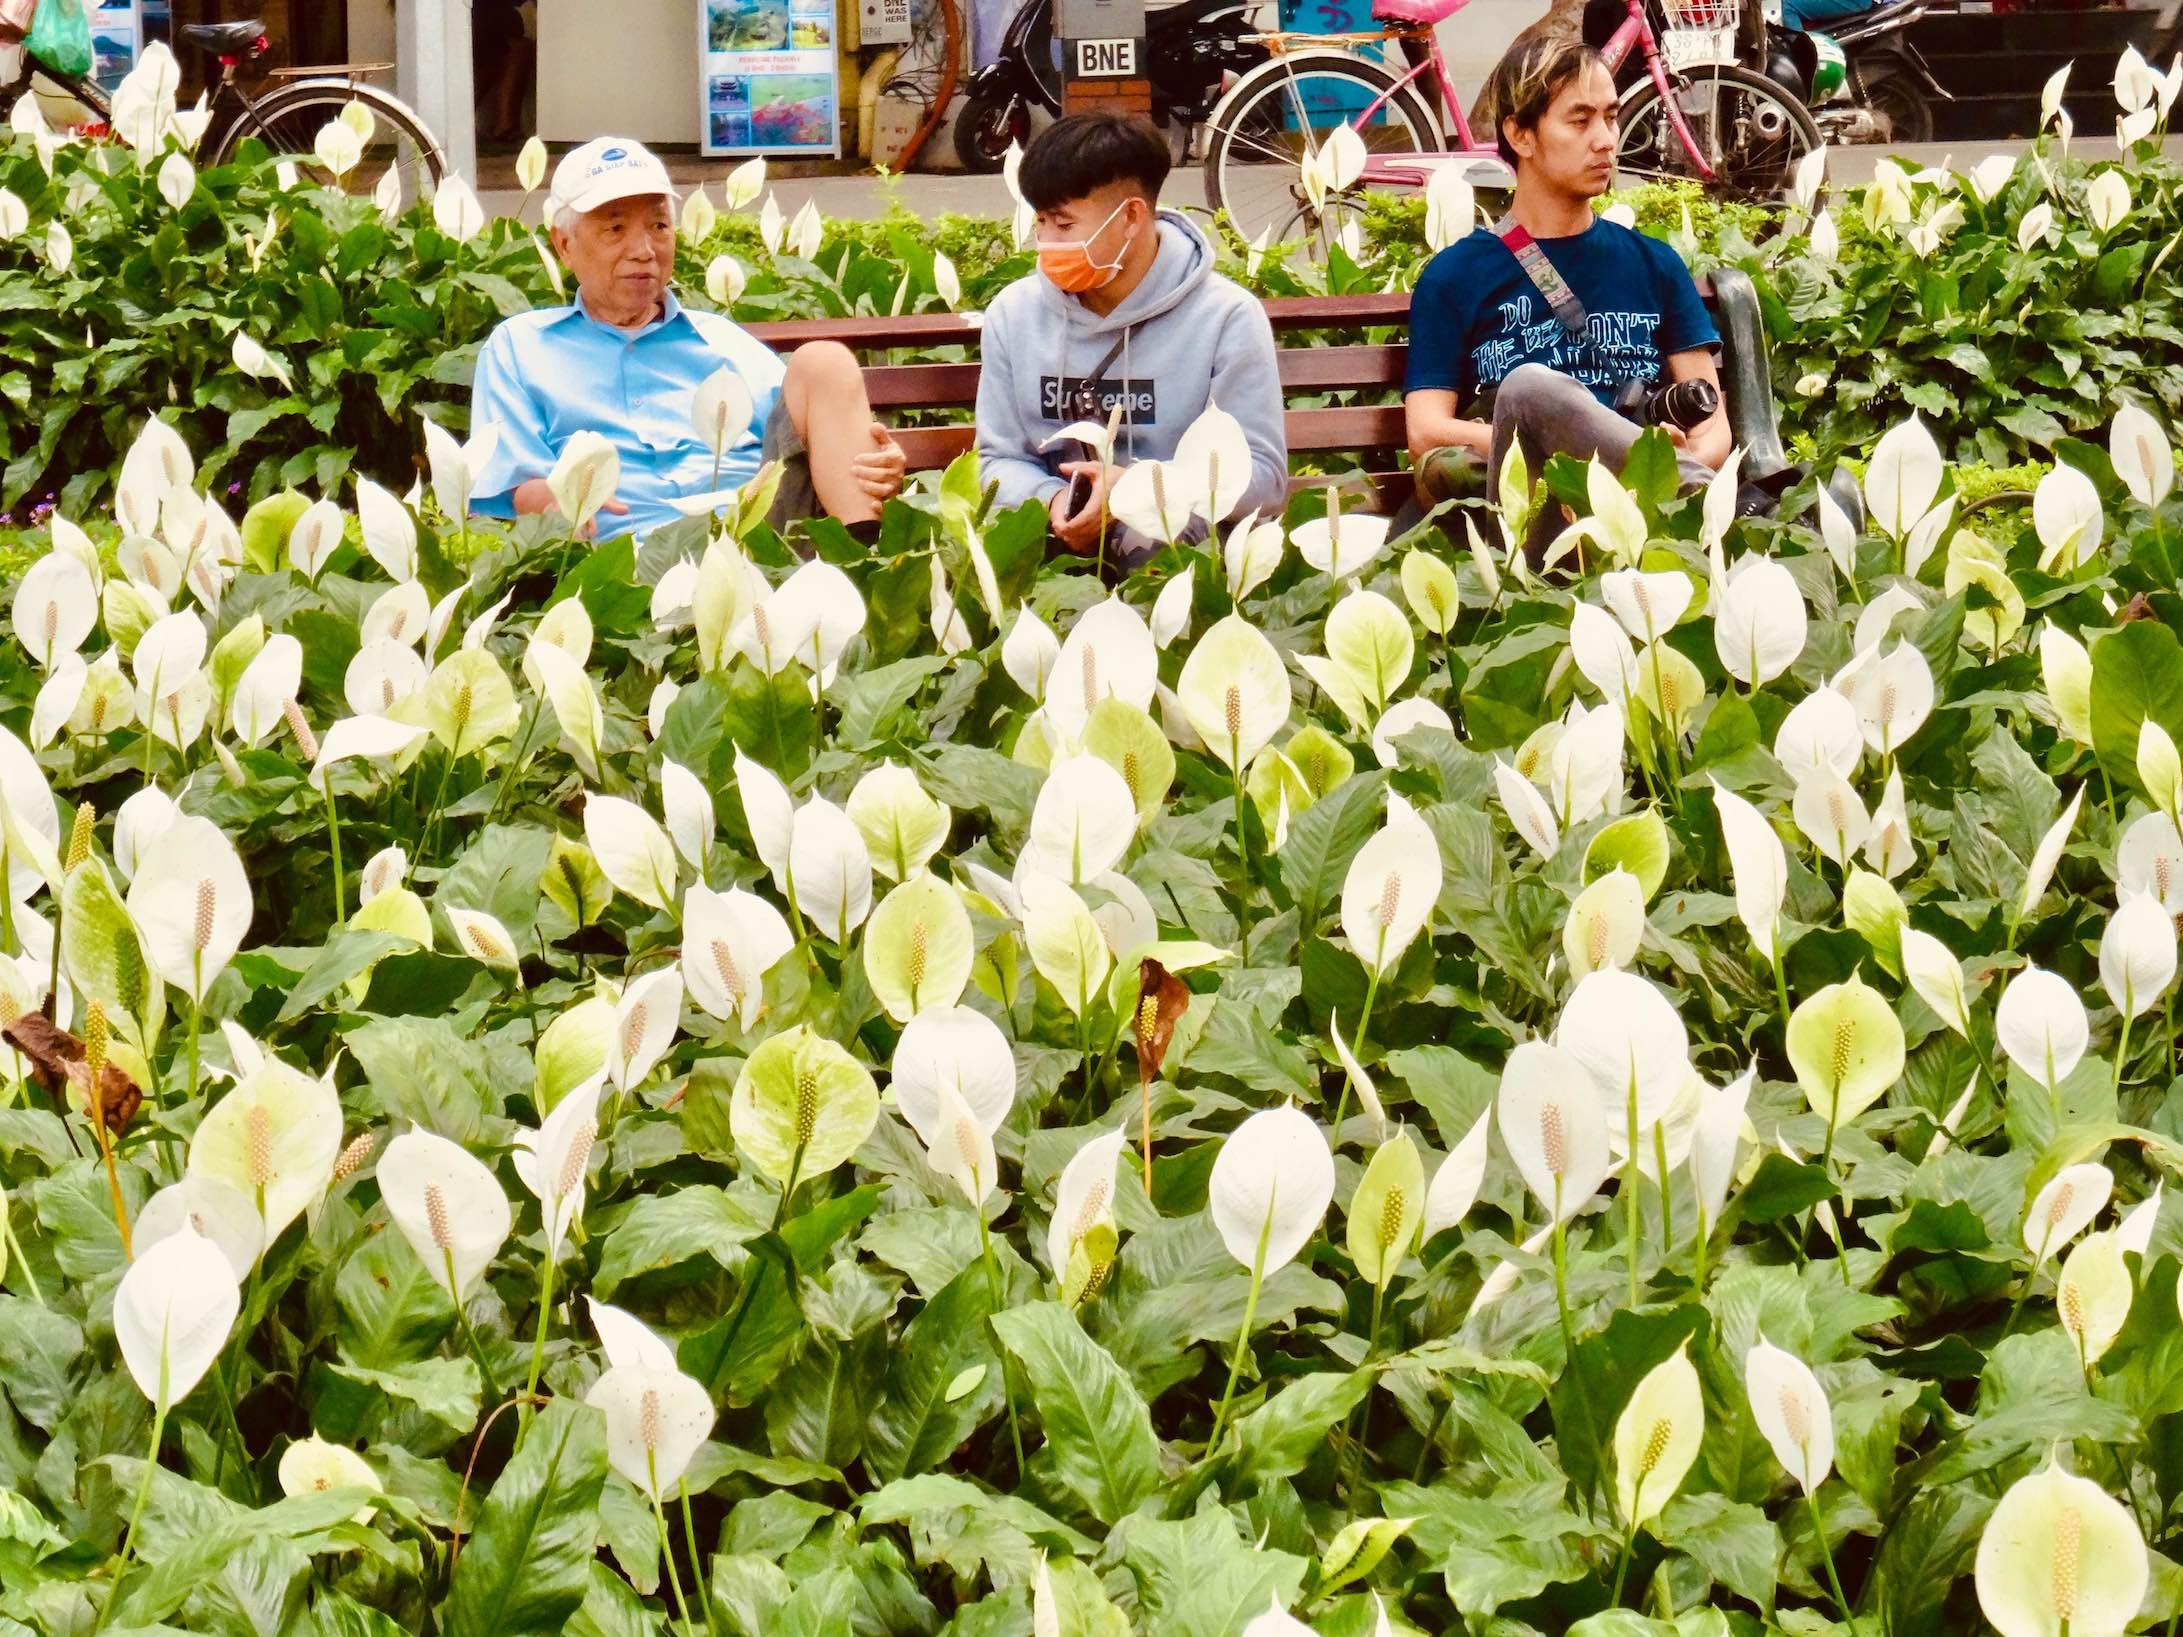 White Calla Lilies in Hanoi Vietnam.